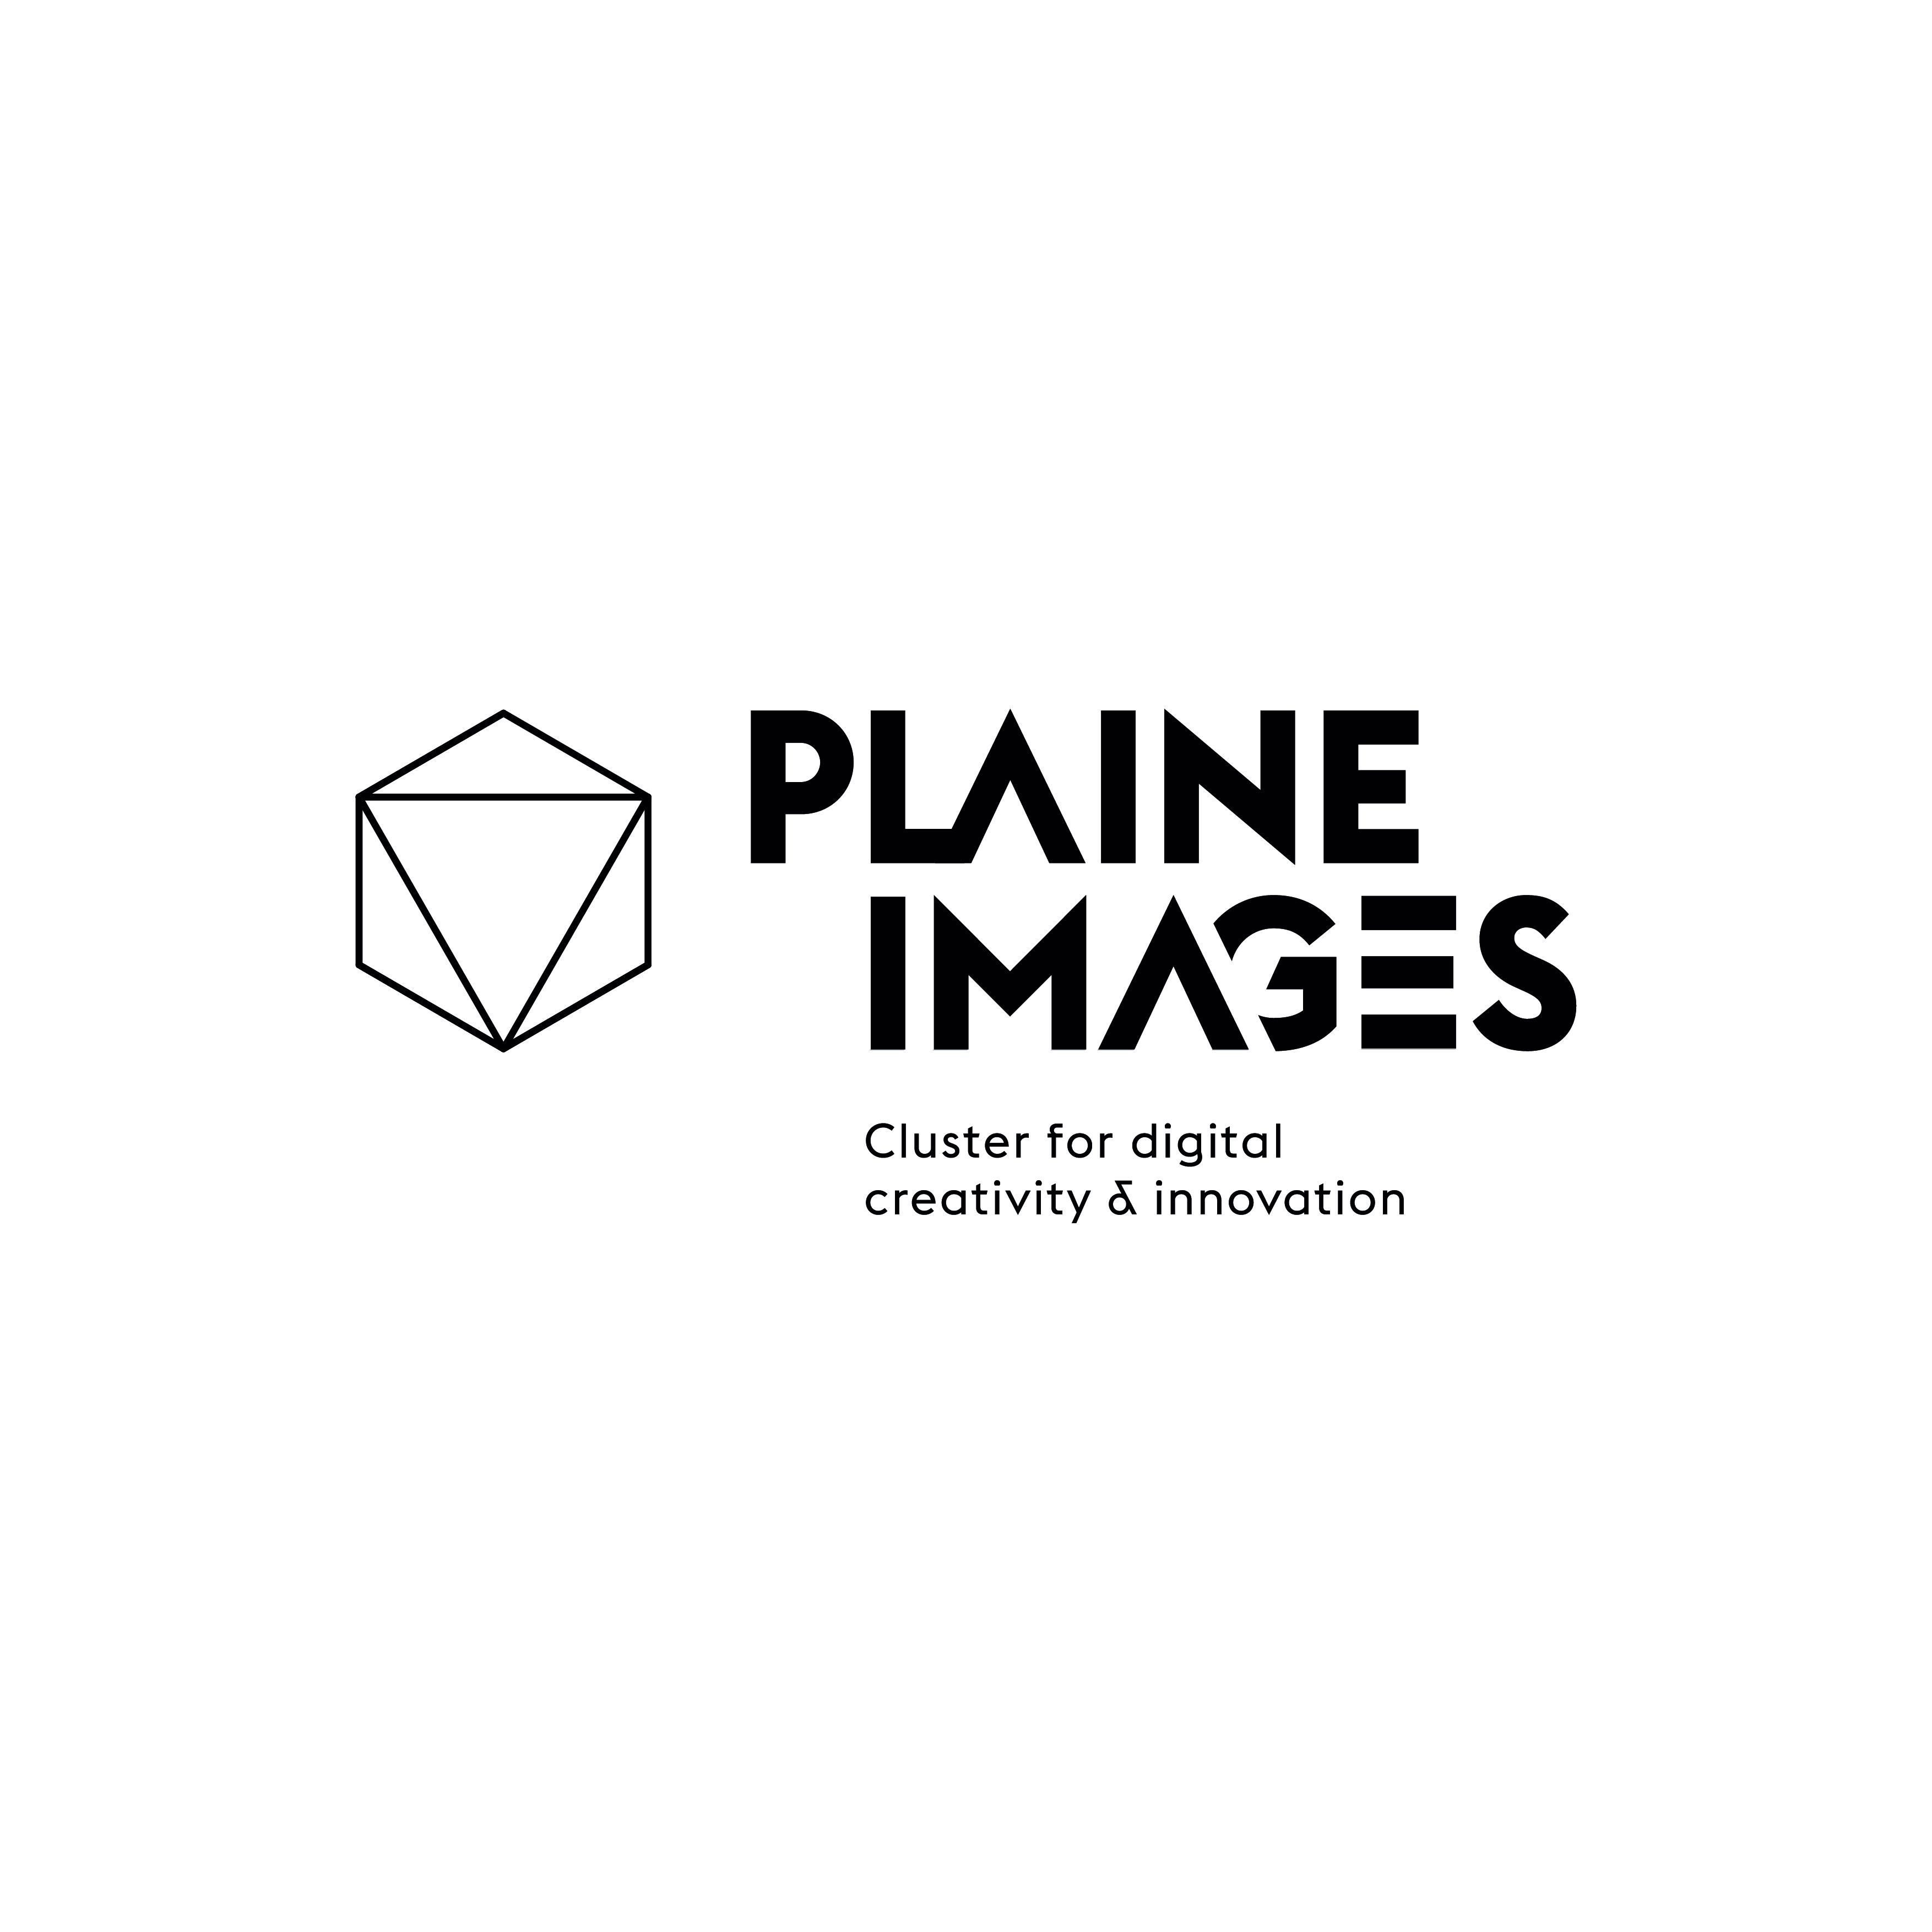 Logo_plaine_images_-62_converted.jpg